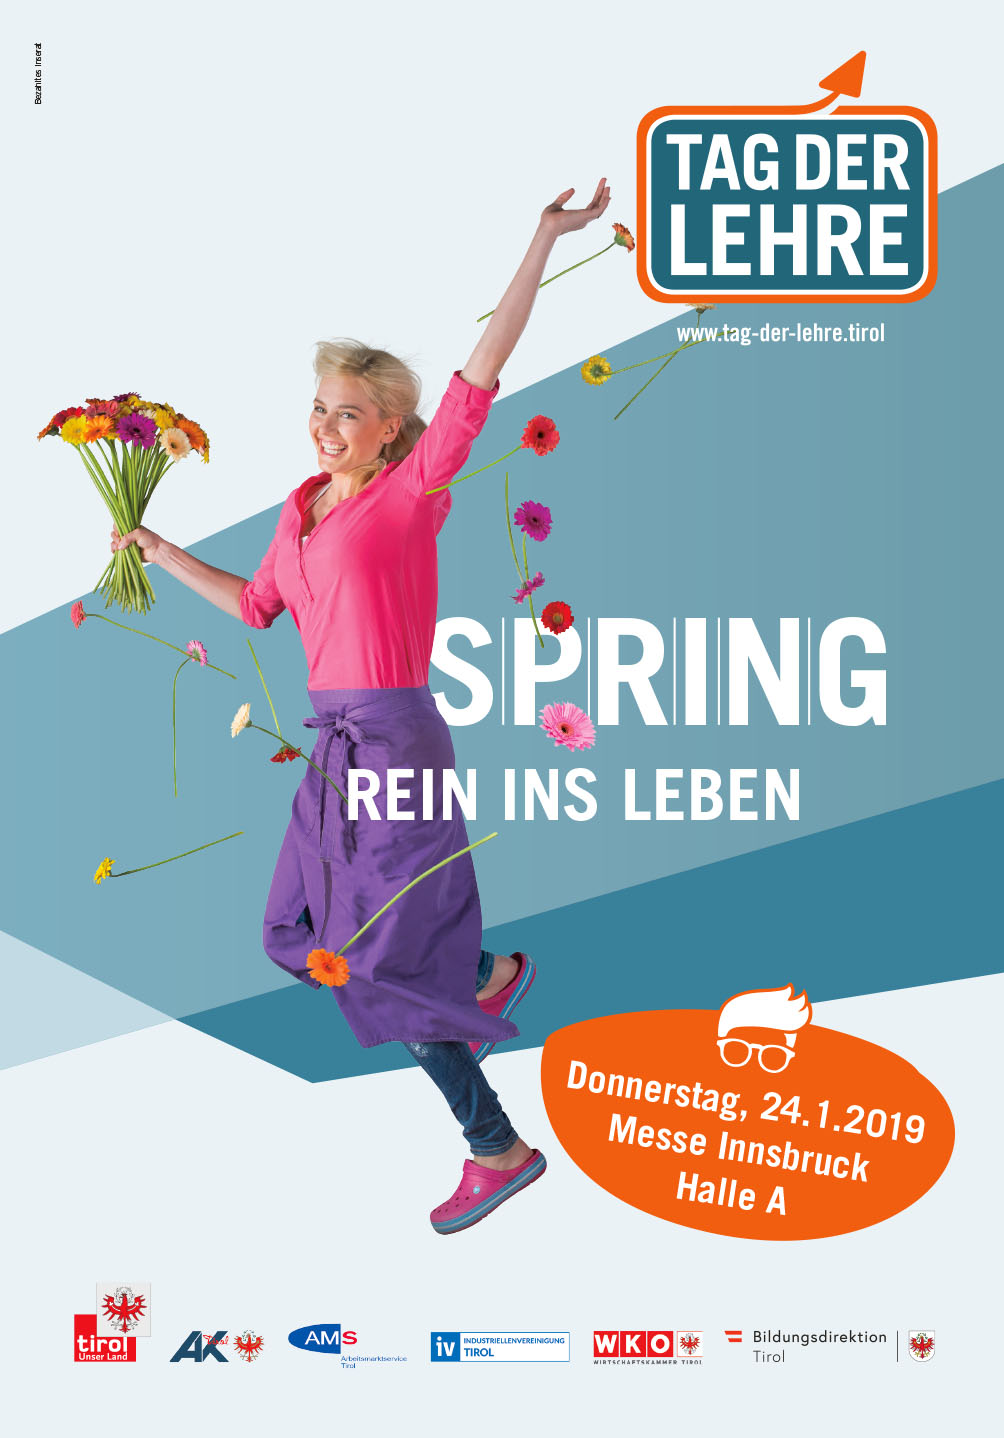 Land Tirol Tage der Lehre 10.01.2019 bis 24.01.2019